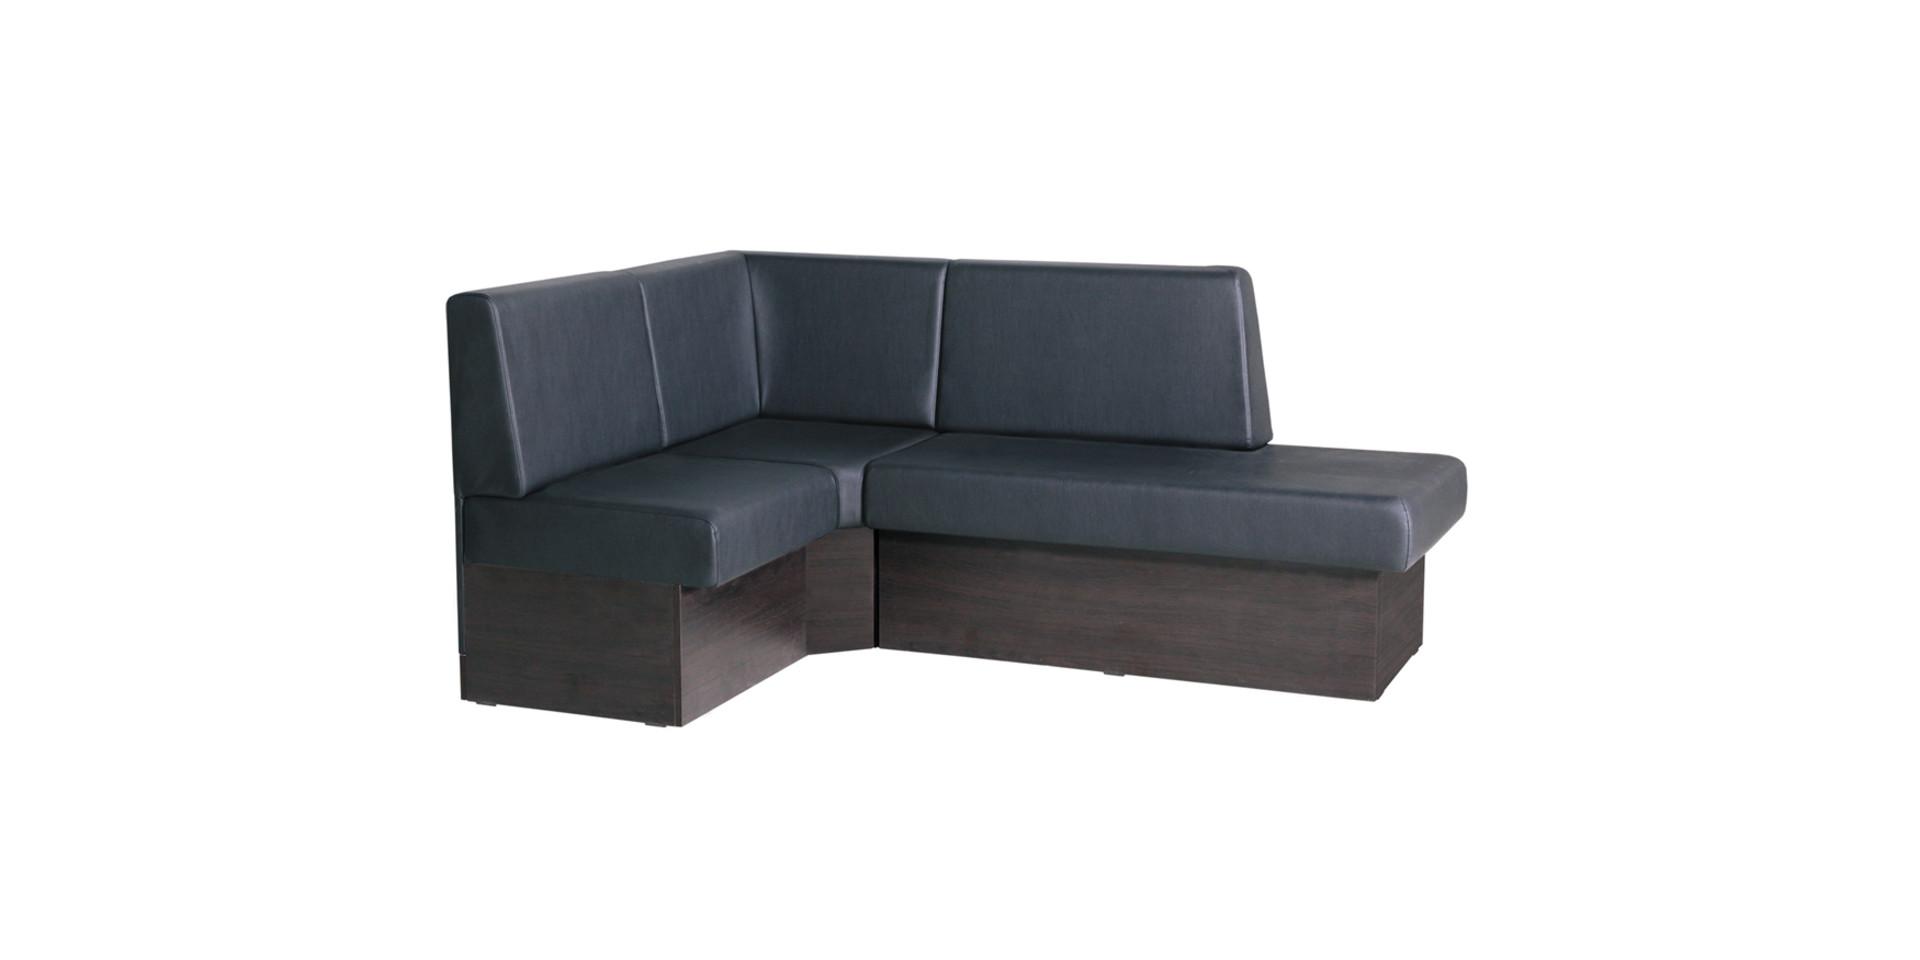 sits-hedda-angle-element100_corner90_bench_oasi_black_2